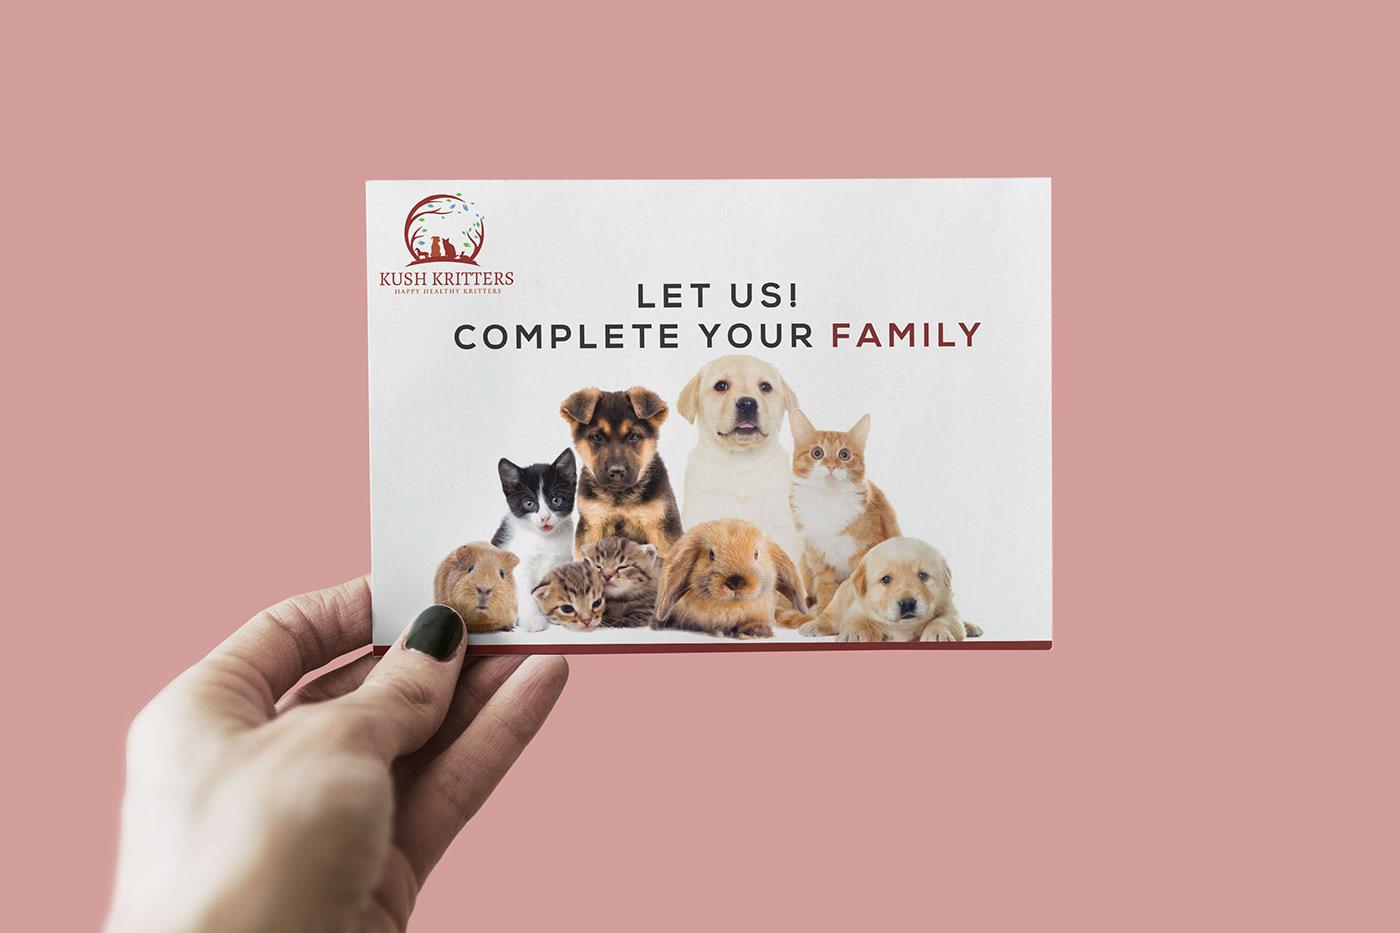 Image may contain: carnivore, dog and animal